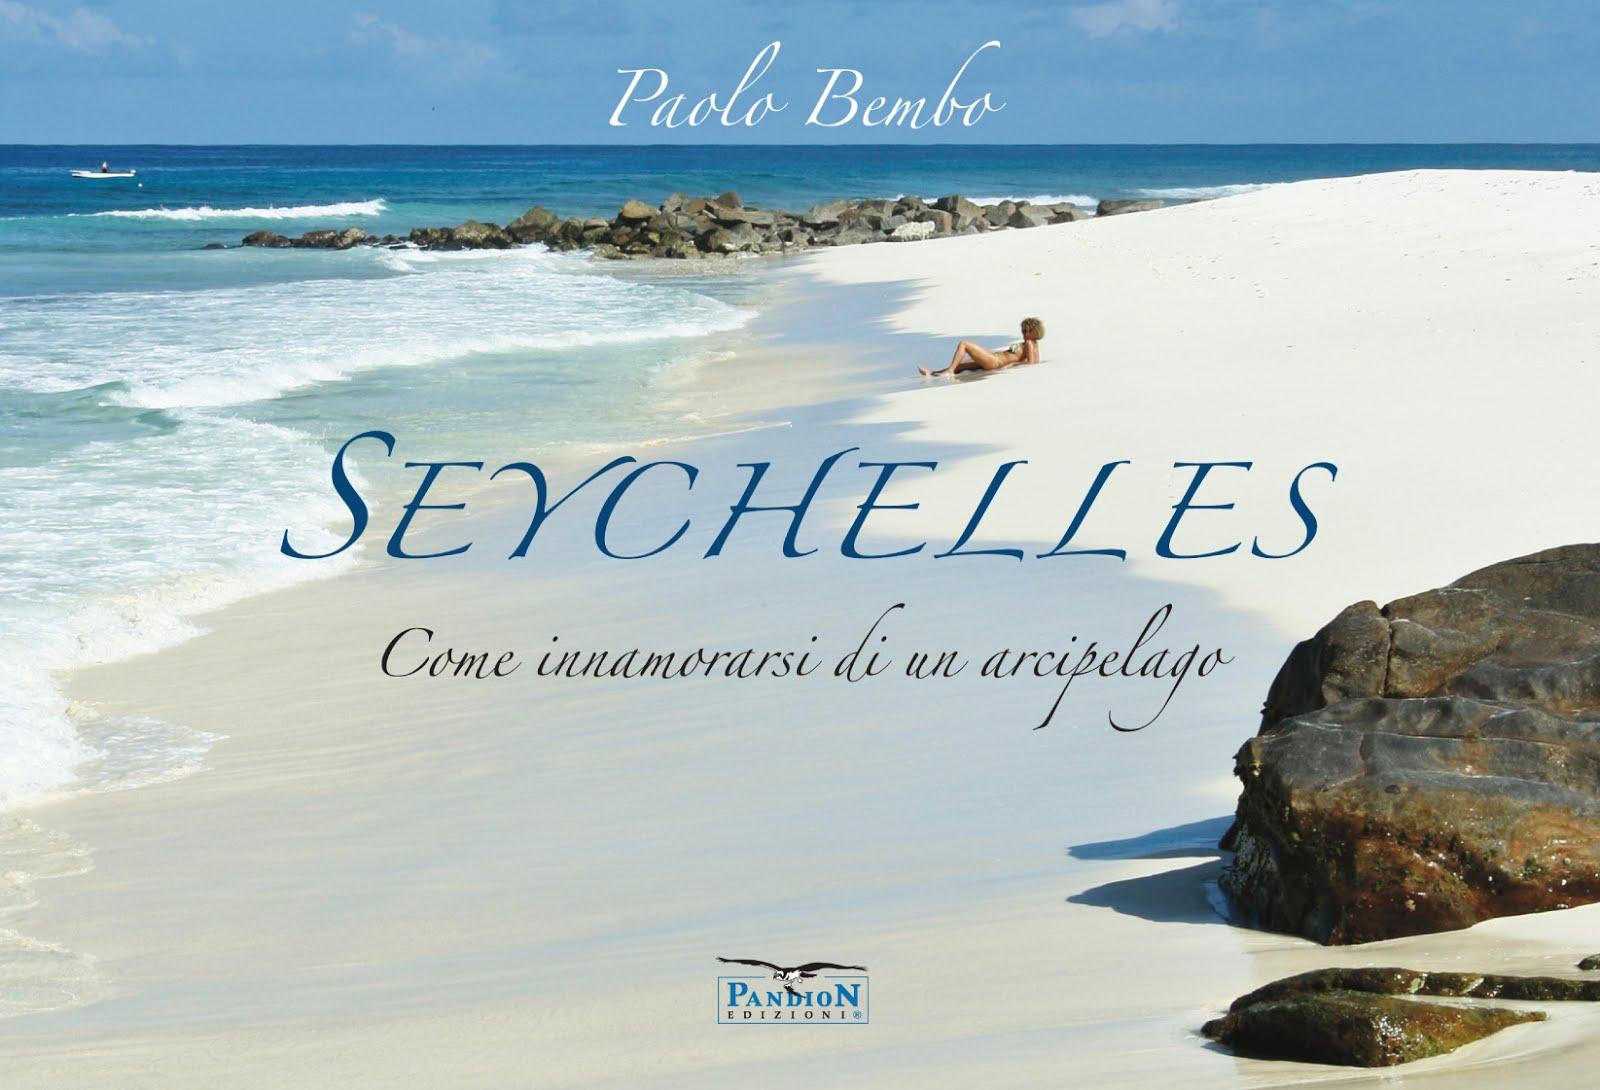 Seychelles - di Paolo Bembo